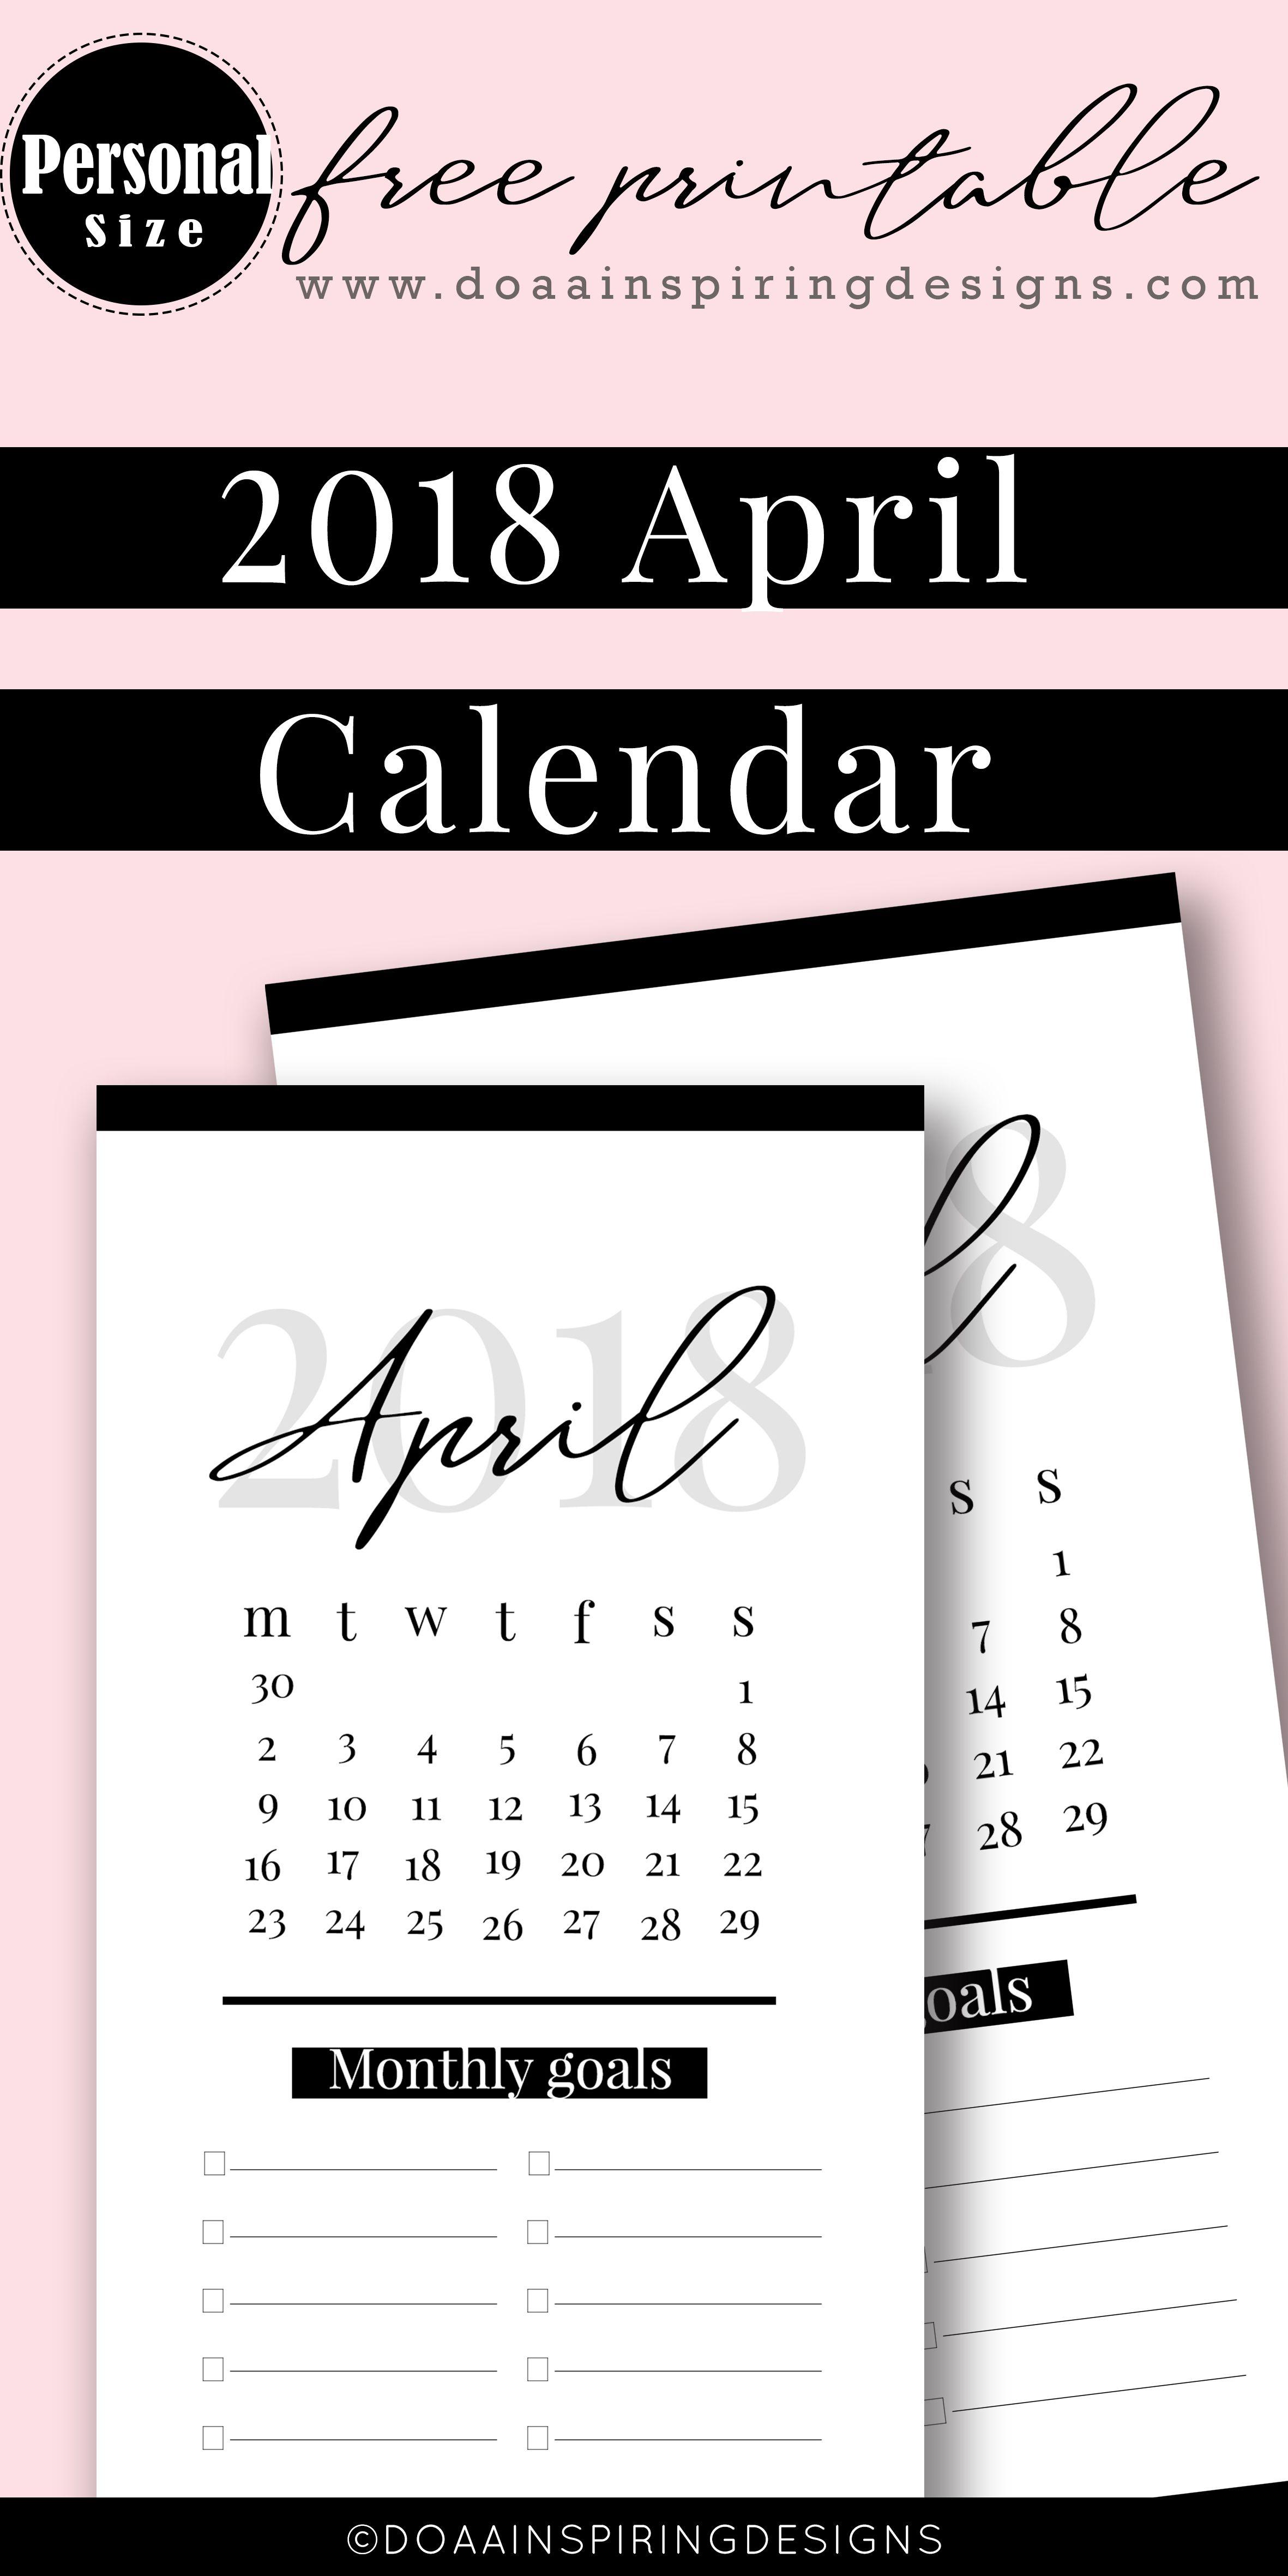 April Calendar Personal Size Calendar Divider Free Printable From Basic Planner